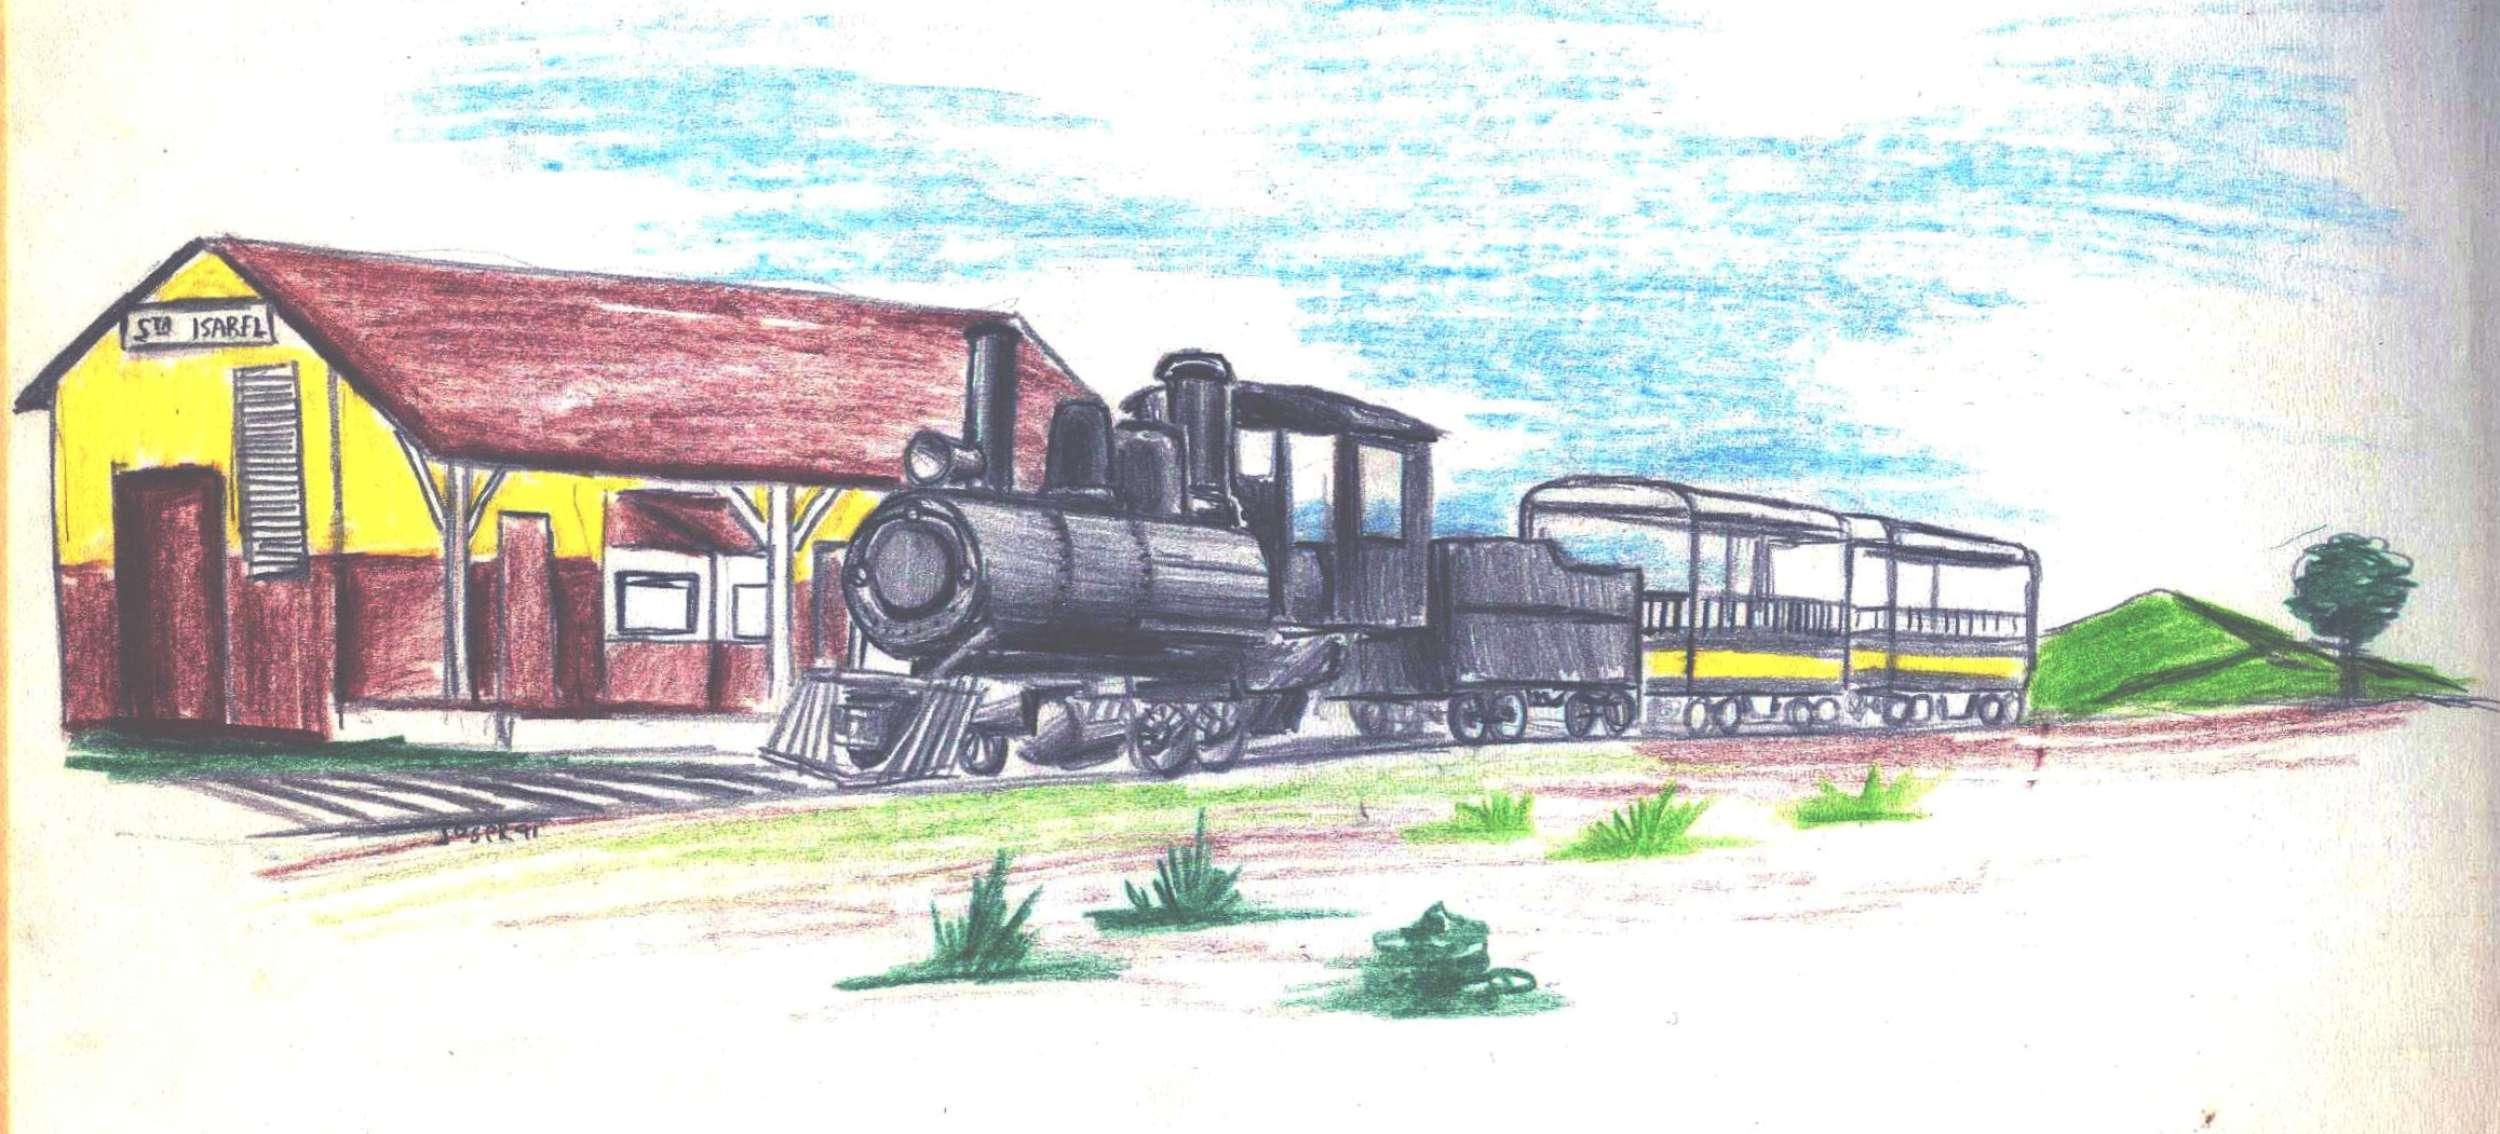 http://ferrocarrilespr.rogerseducationalpage.com/wp-content/uploads/2012/04/Tren-de-Turismo-2-2500.jpg